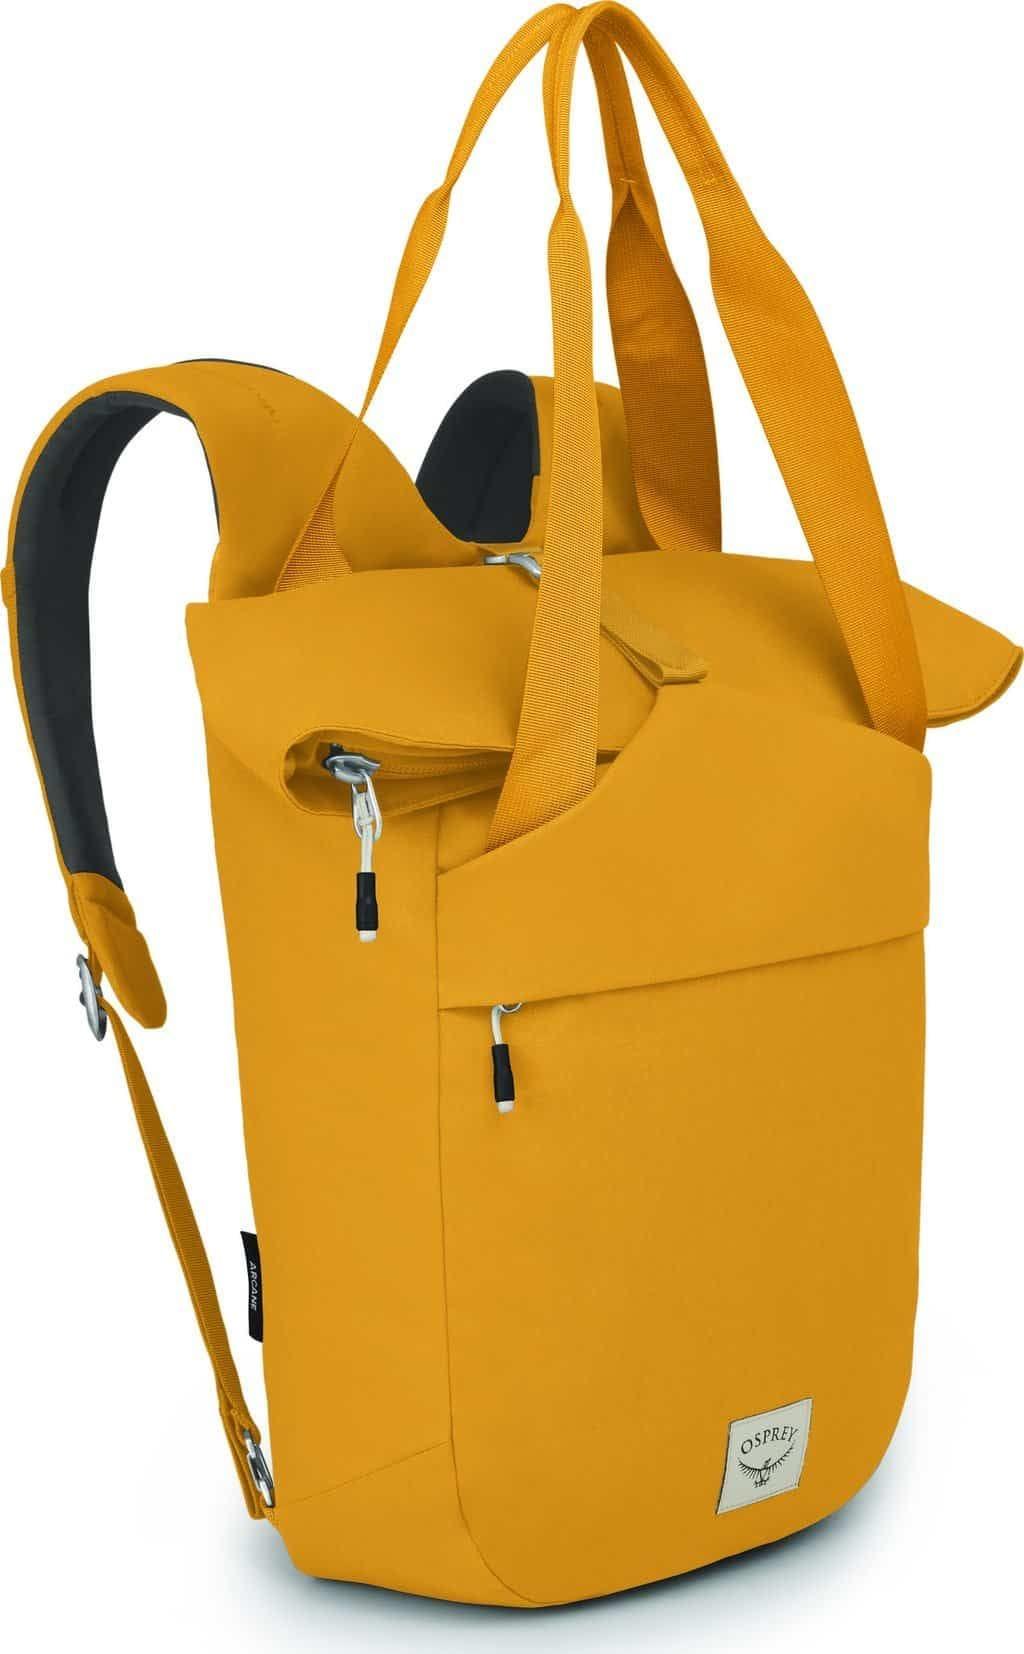 Arcane Tote Bag - Osprey